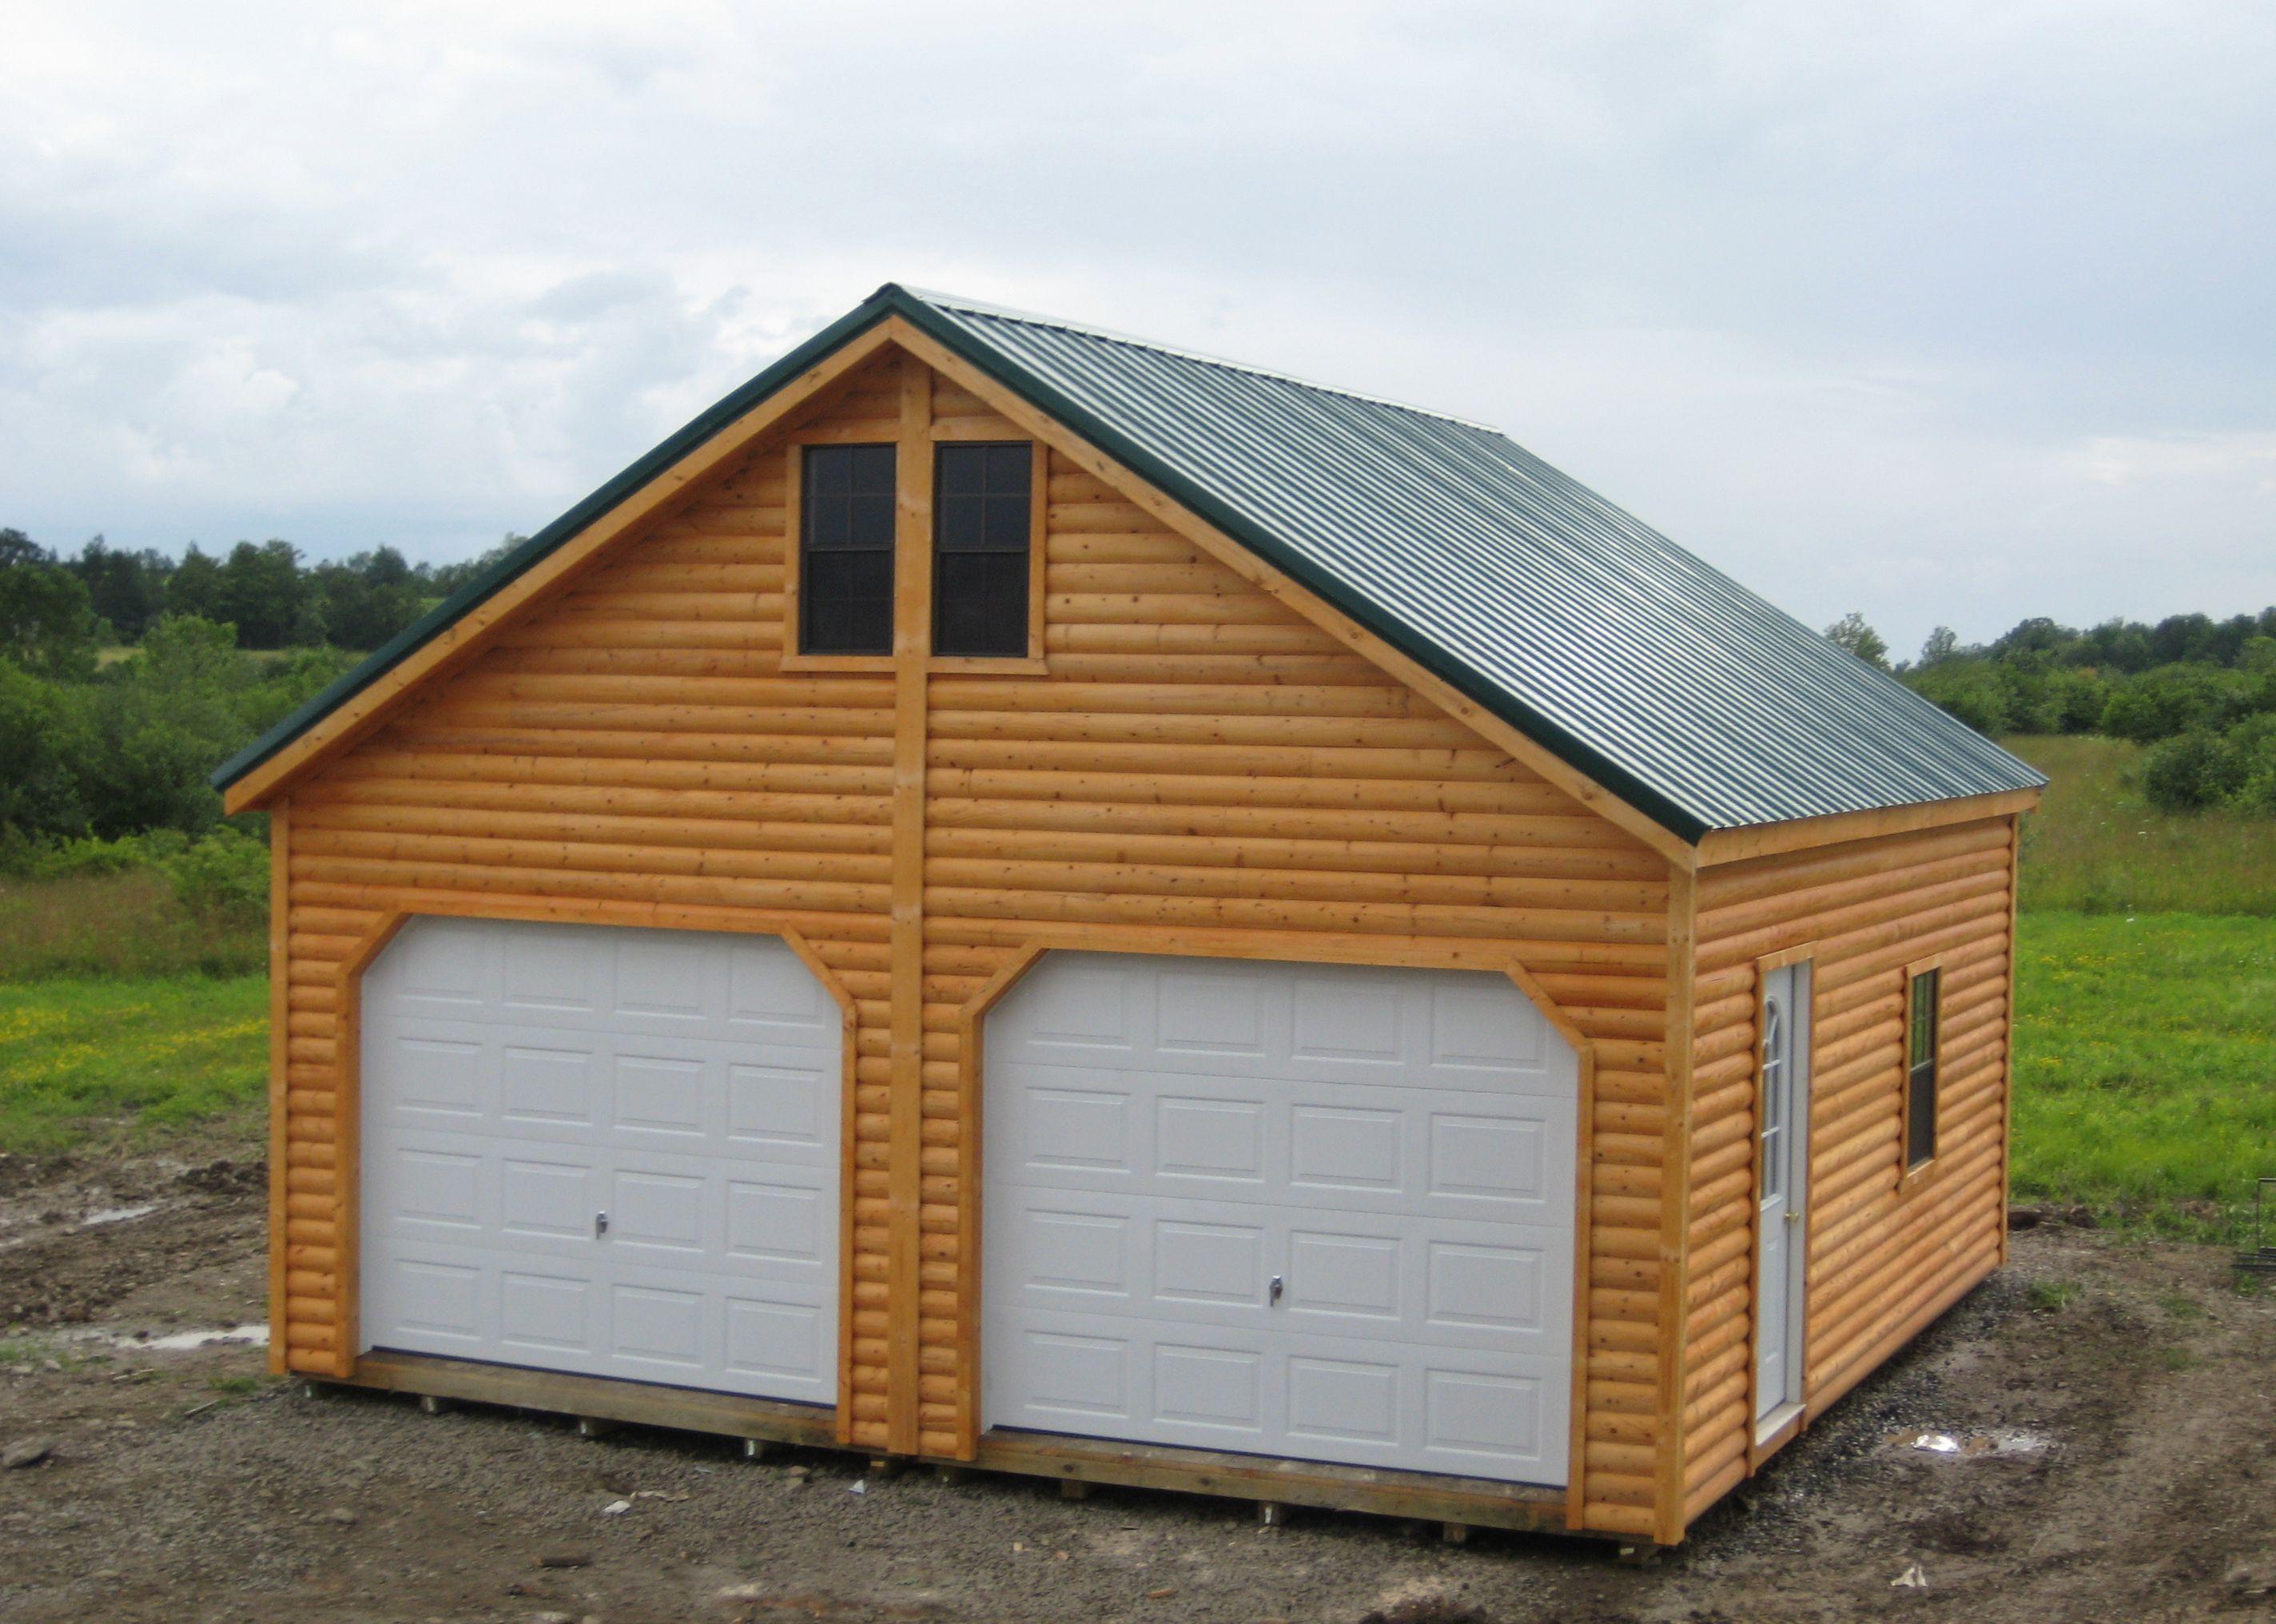 Log Siding On This Woodtex Garage